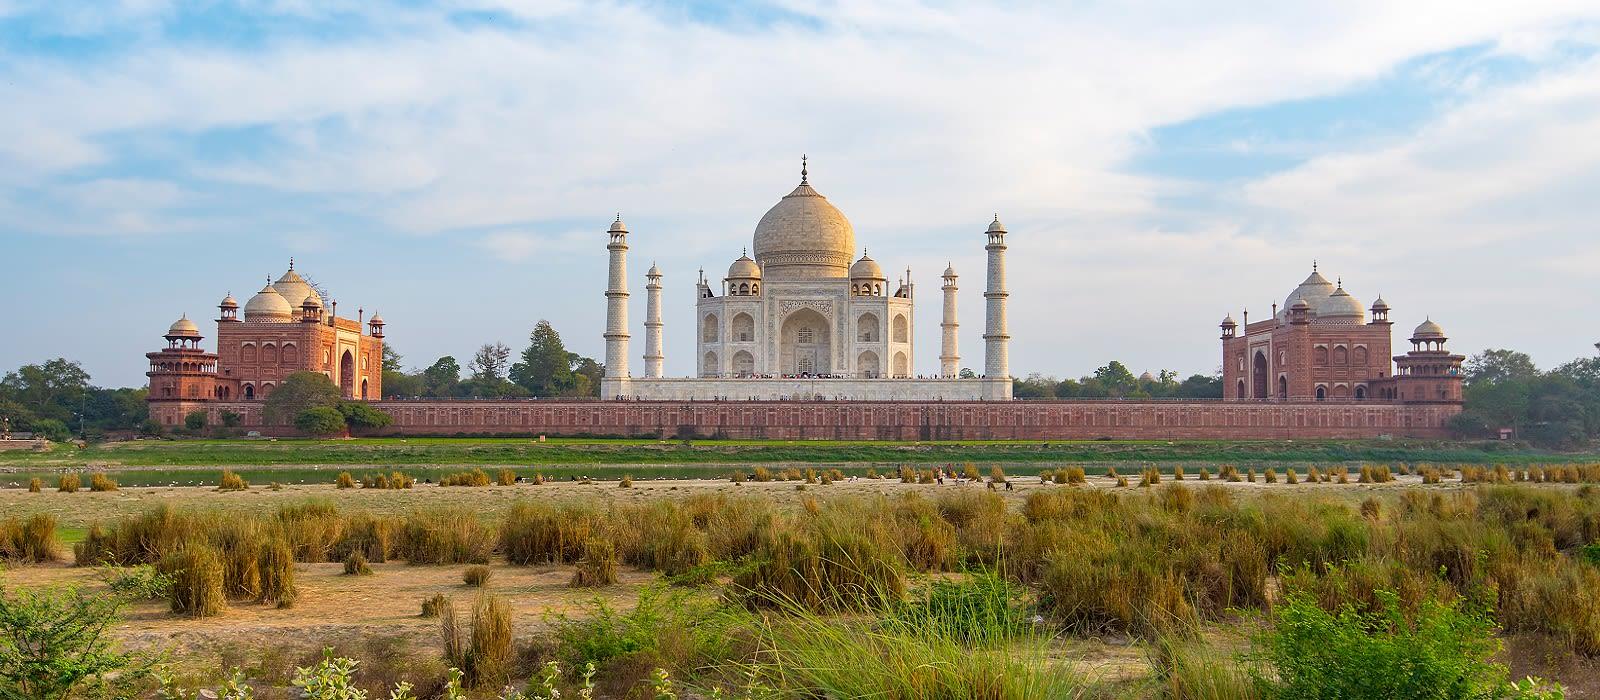 Taj Special: Tiger Trails of India Tour Trip 4